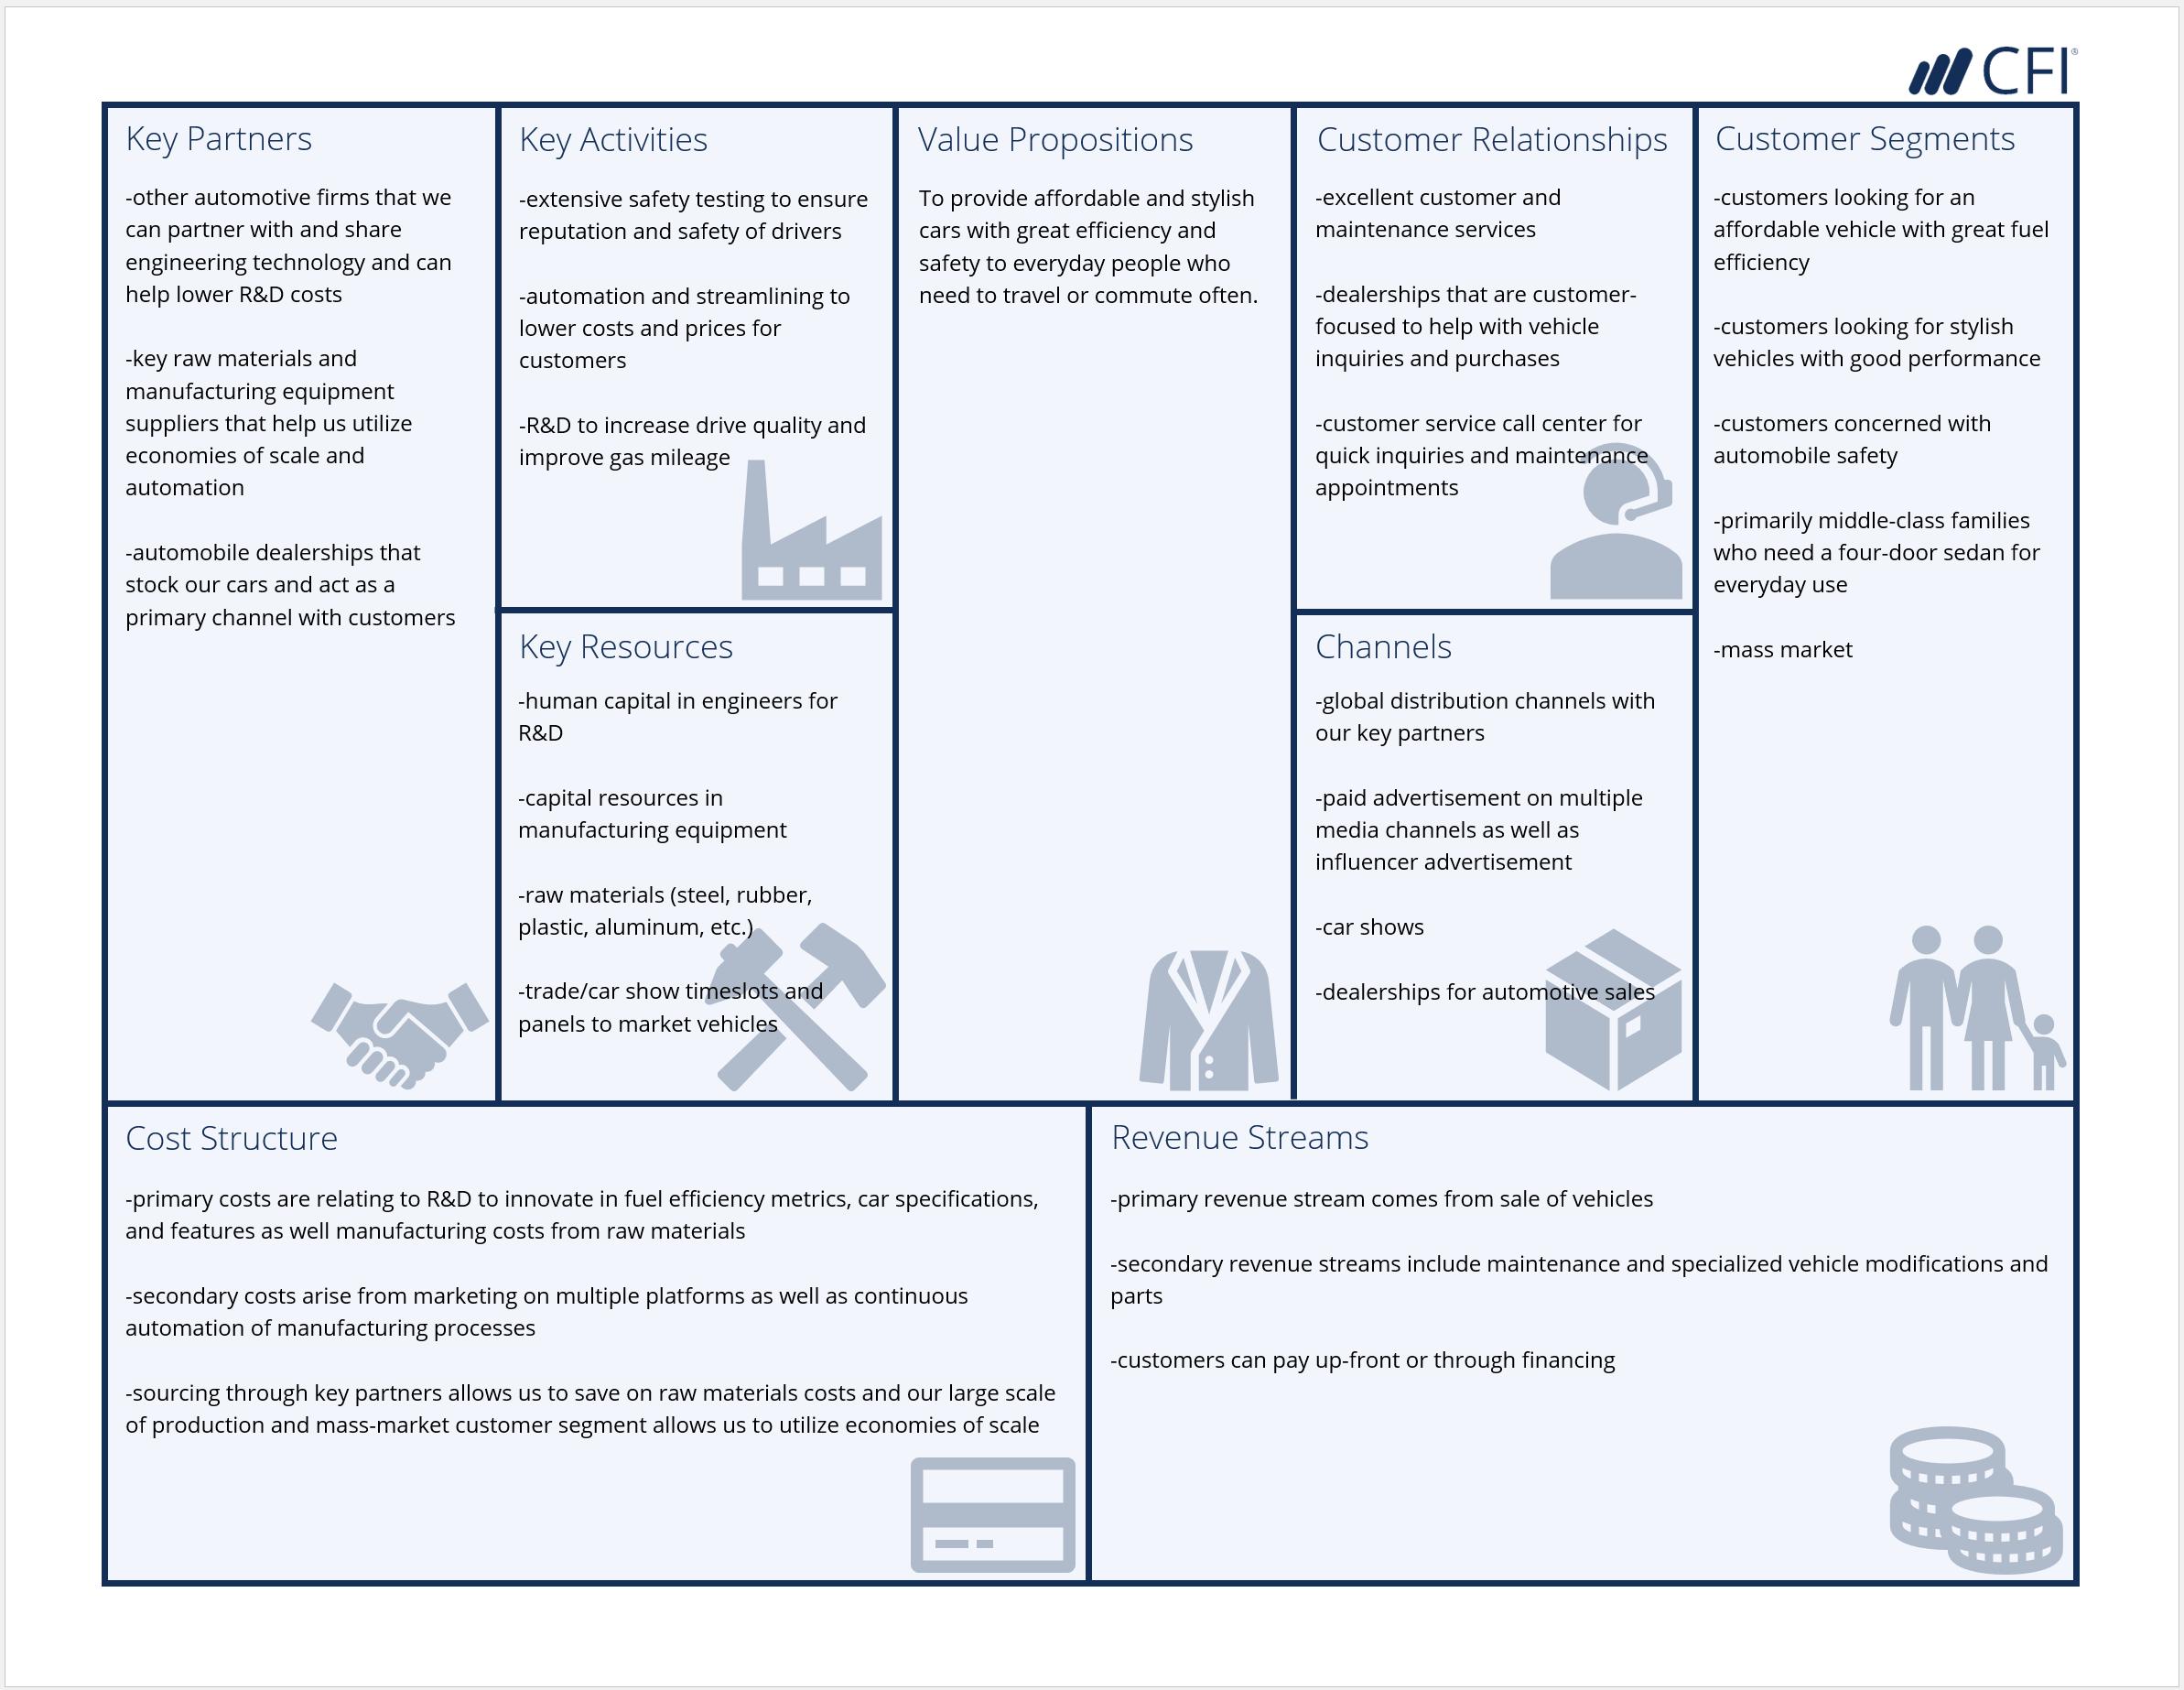 Business Model Canvas Automotive Example Business Model Canvas Business Model Canvas Examples Business Canvas